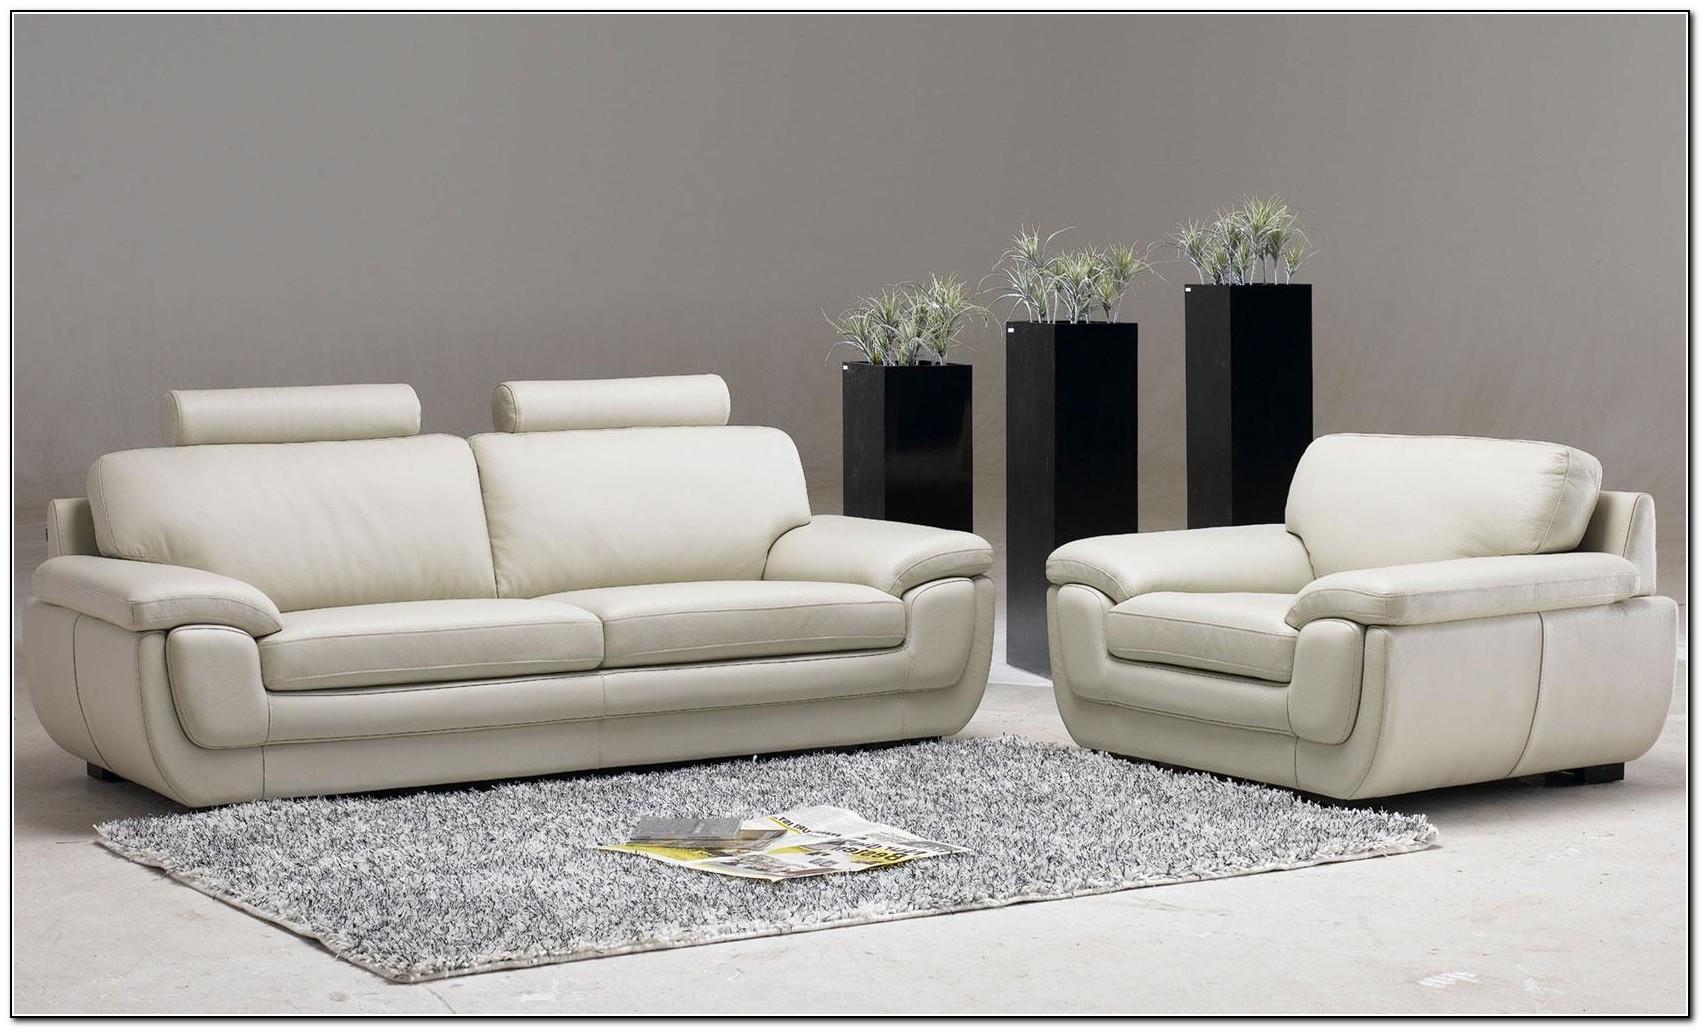 White Leather Sofa Living Room Design